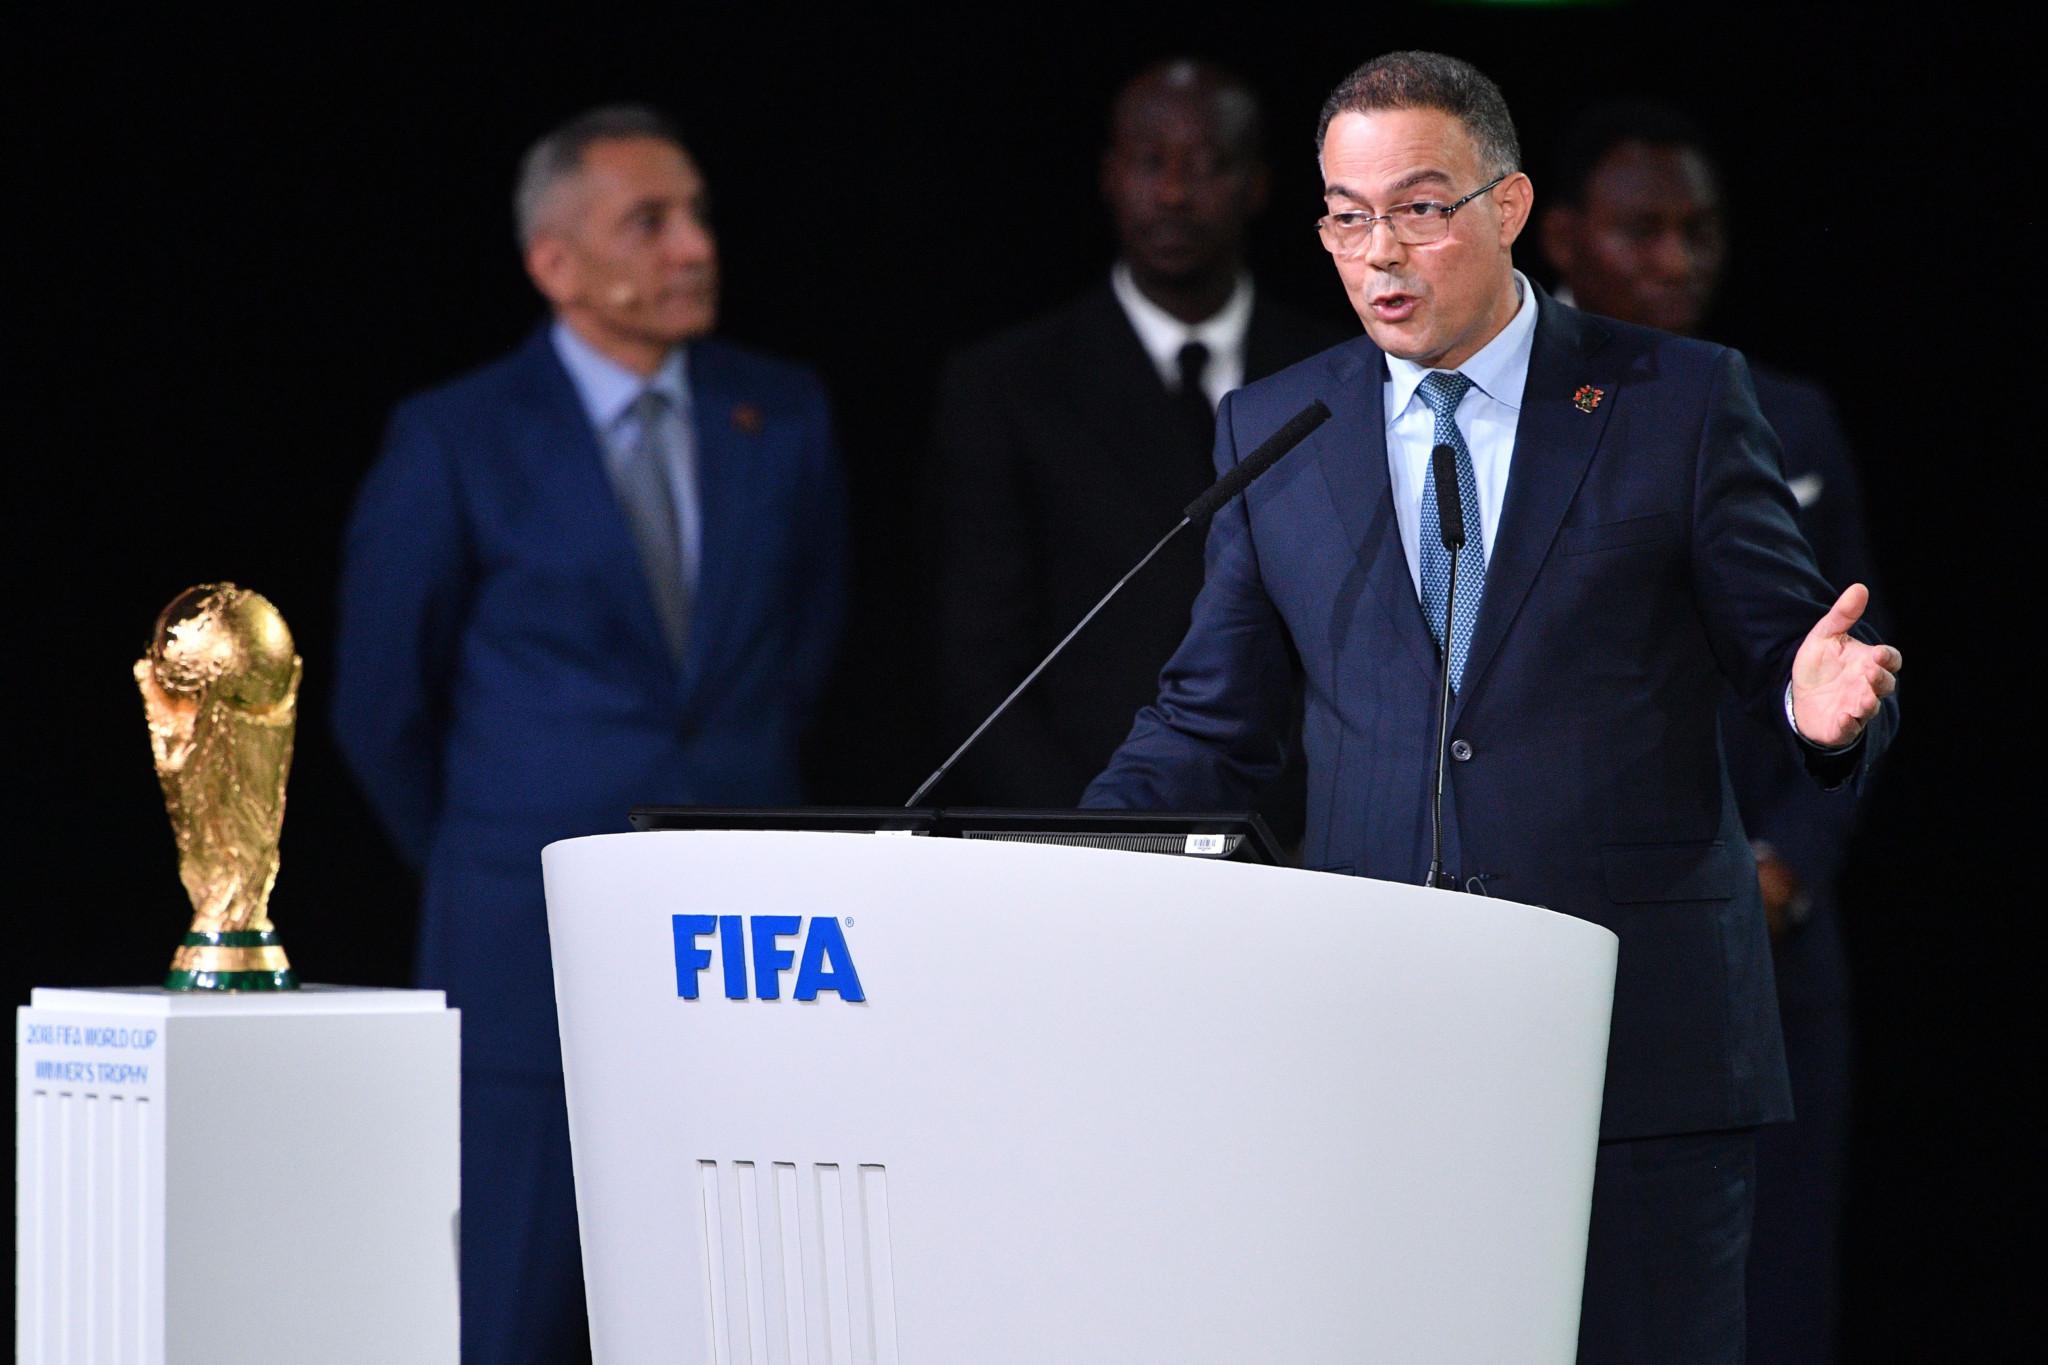 Morocco in reported talks with Spain, Portugal, Algeria and Tunisia over FIFA World Cup 2030 bid